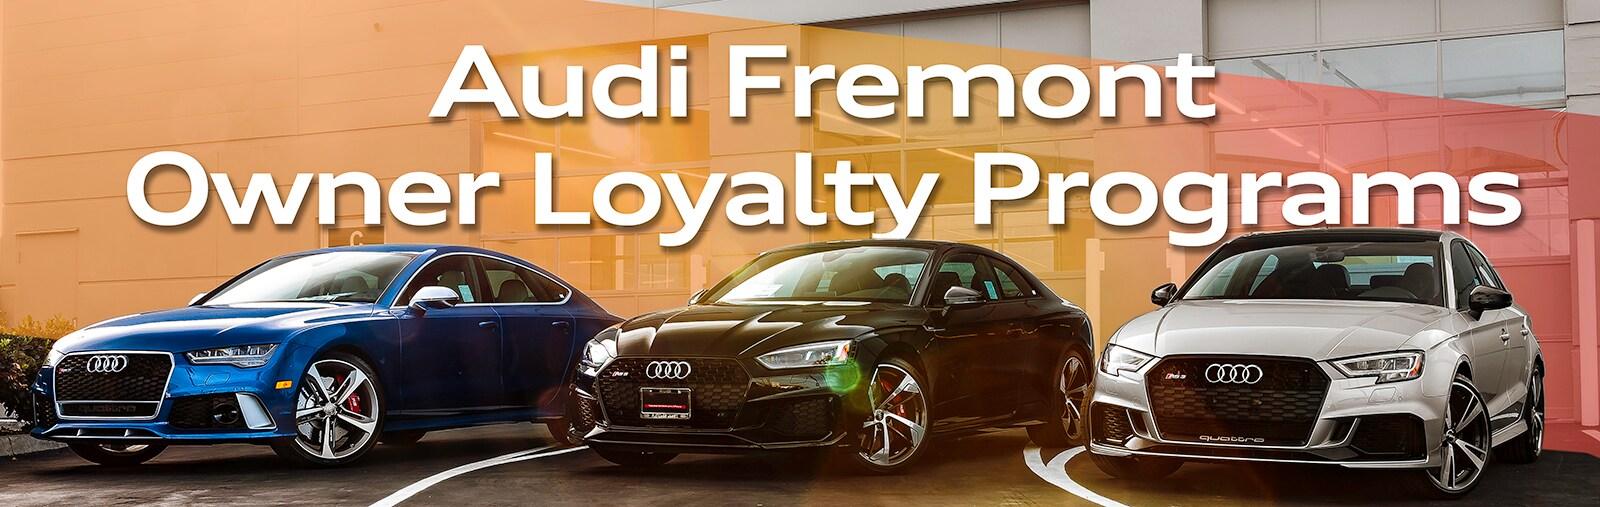 Audi Fremont Owner Loyalty Programs Audi Fremont